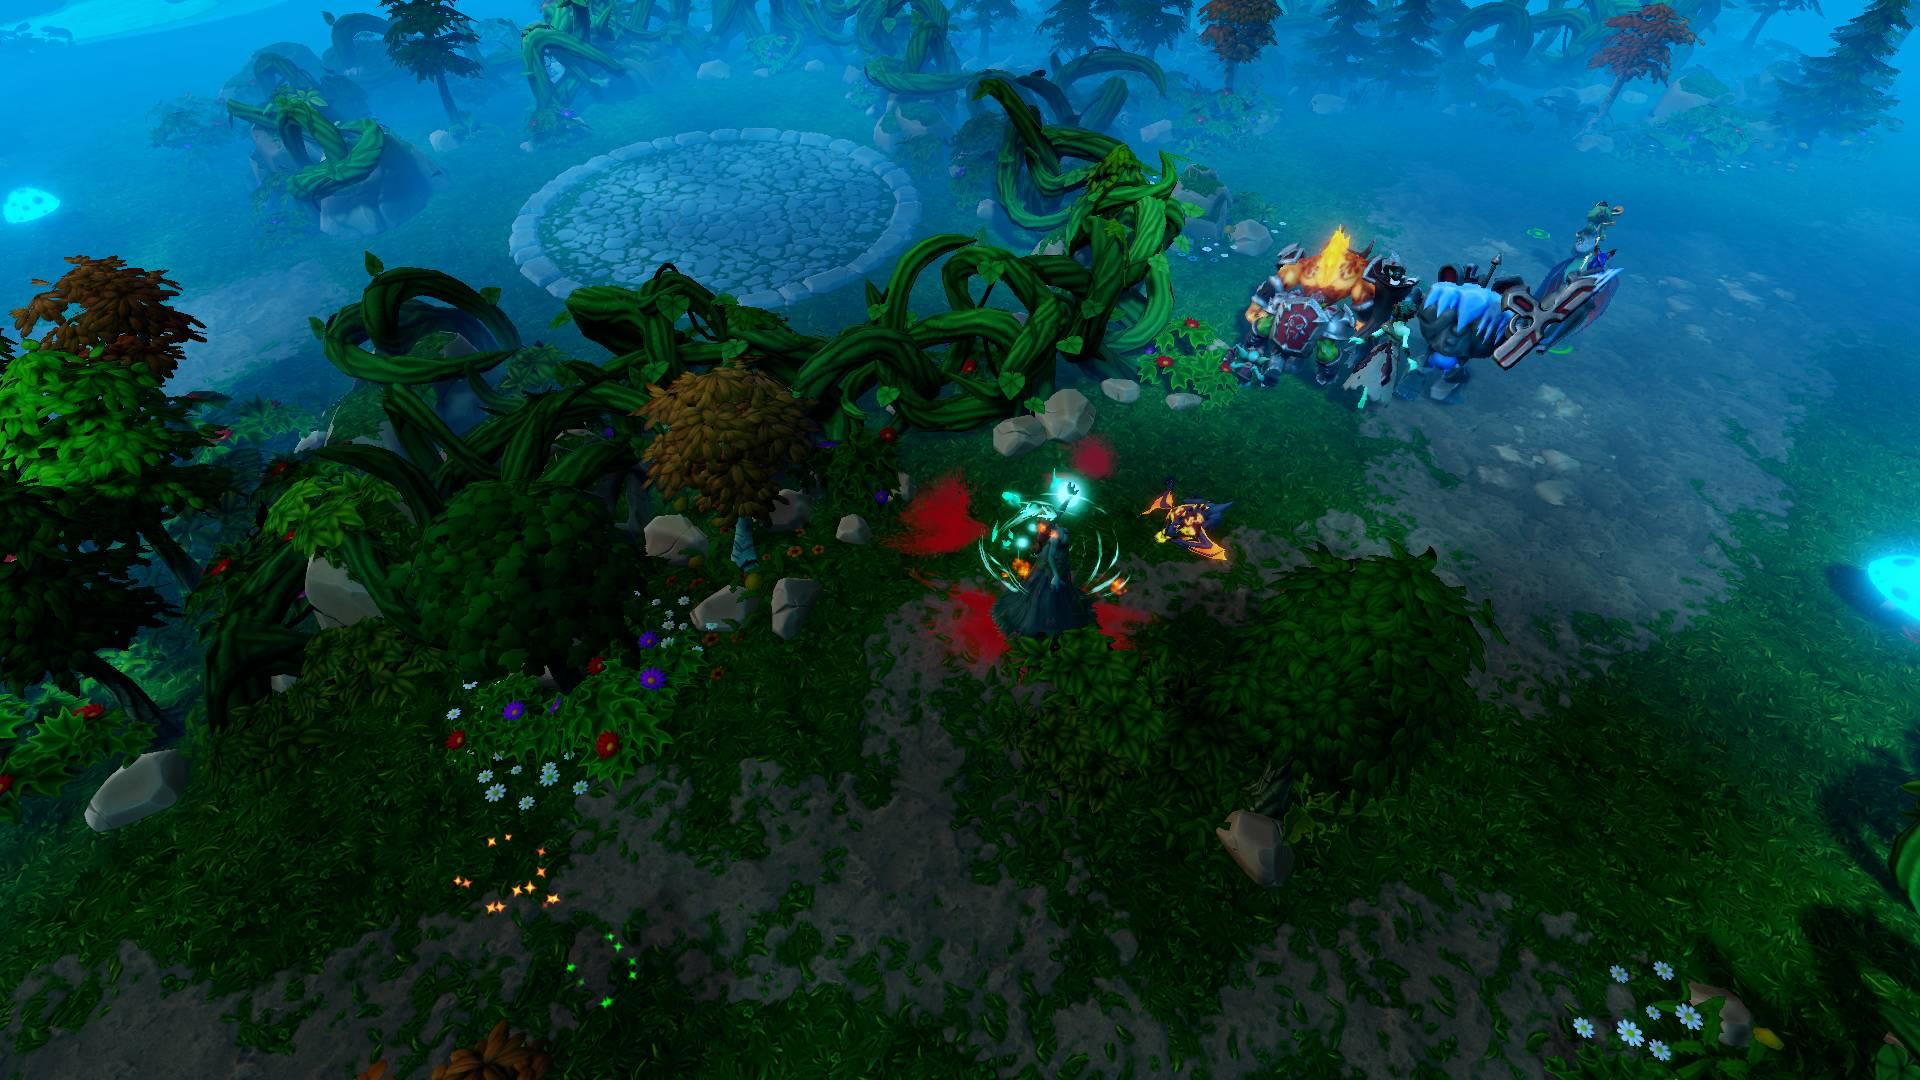 Dungeons 3: An Unexpected DLC